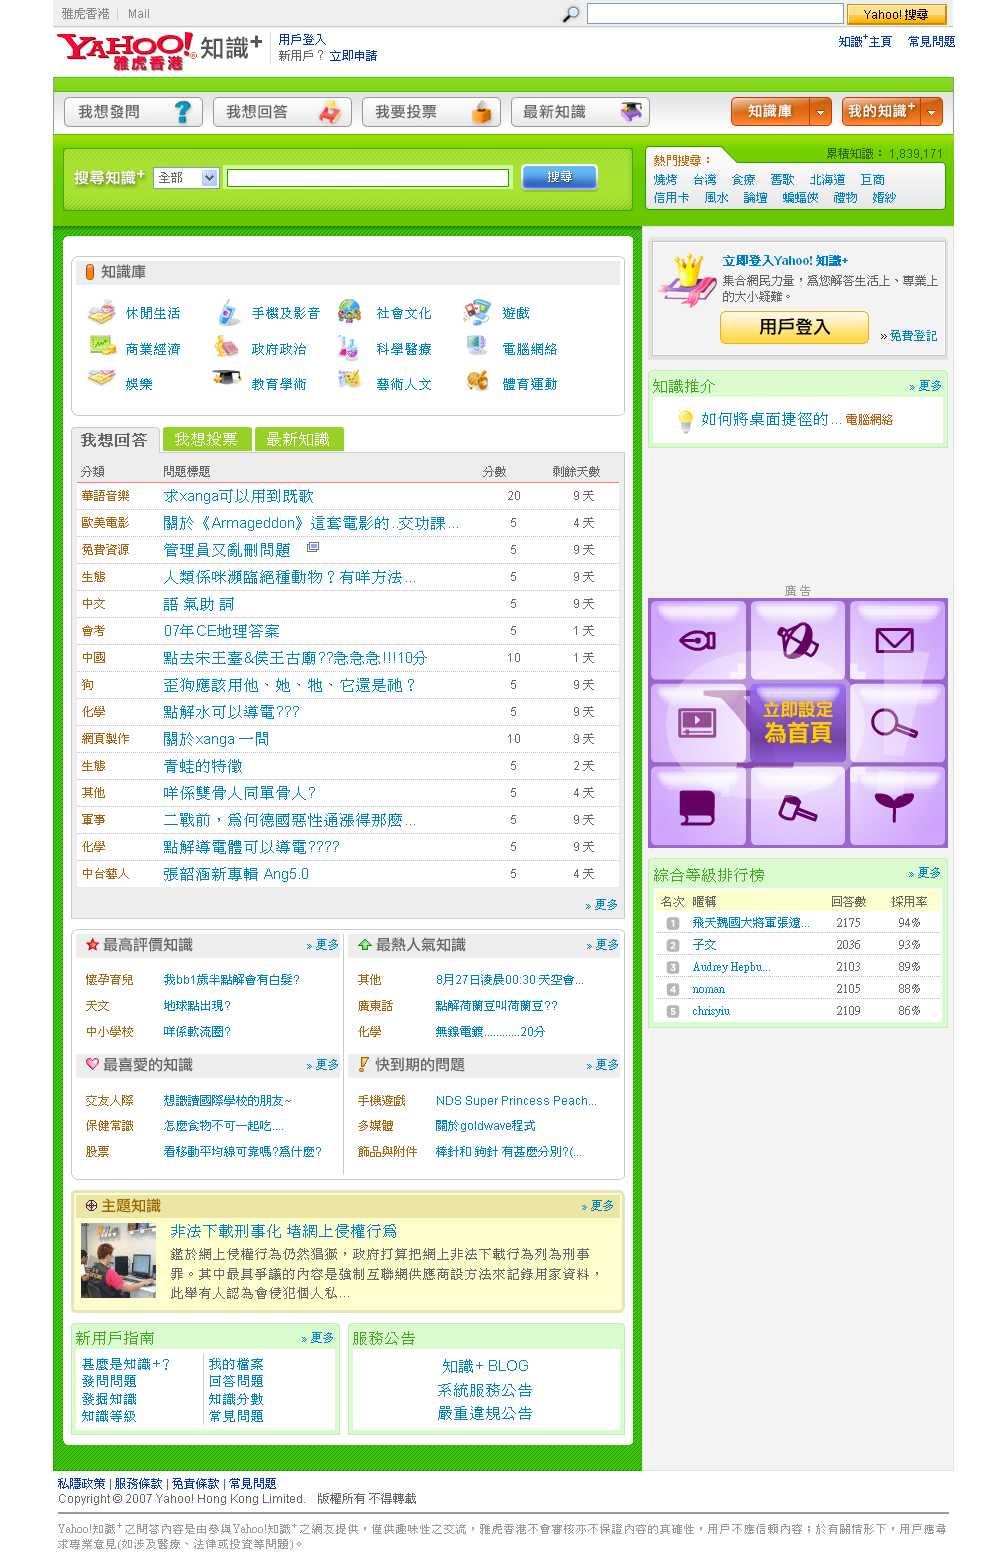 改制 (Yahoo!知識+)